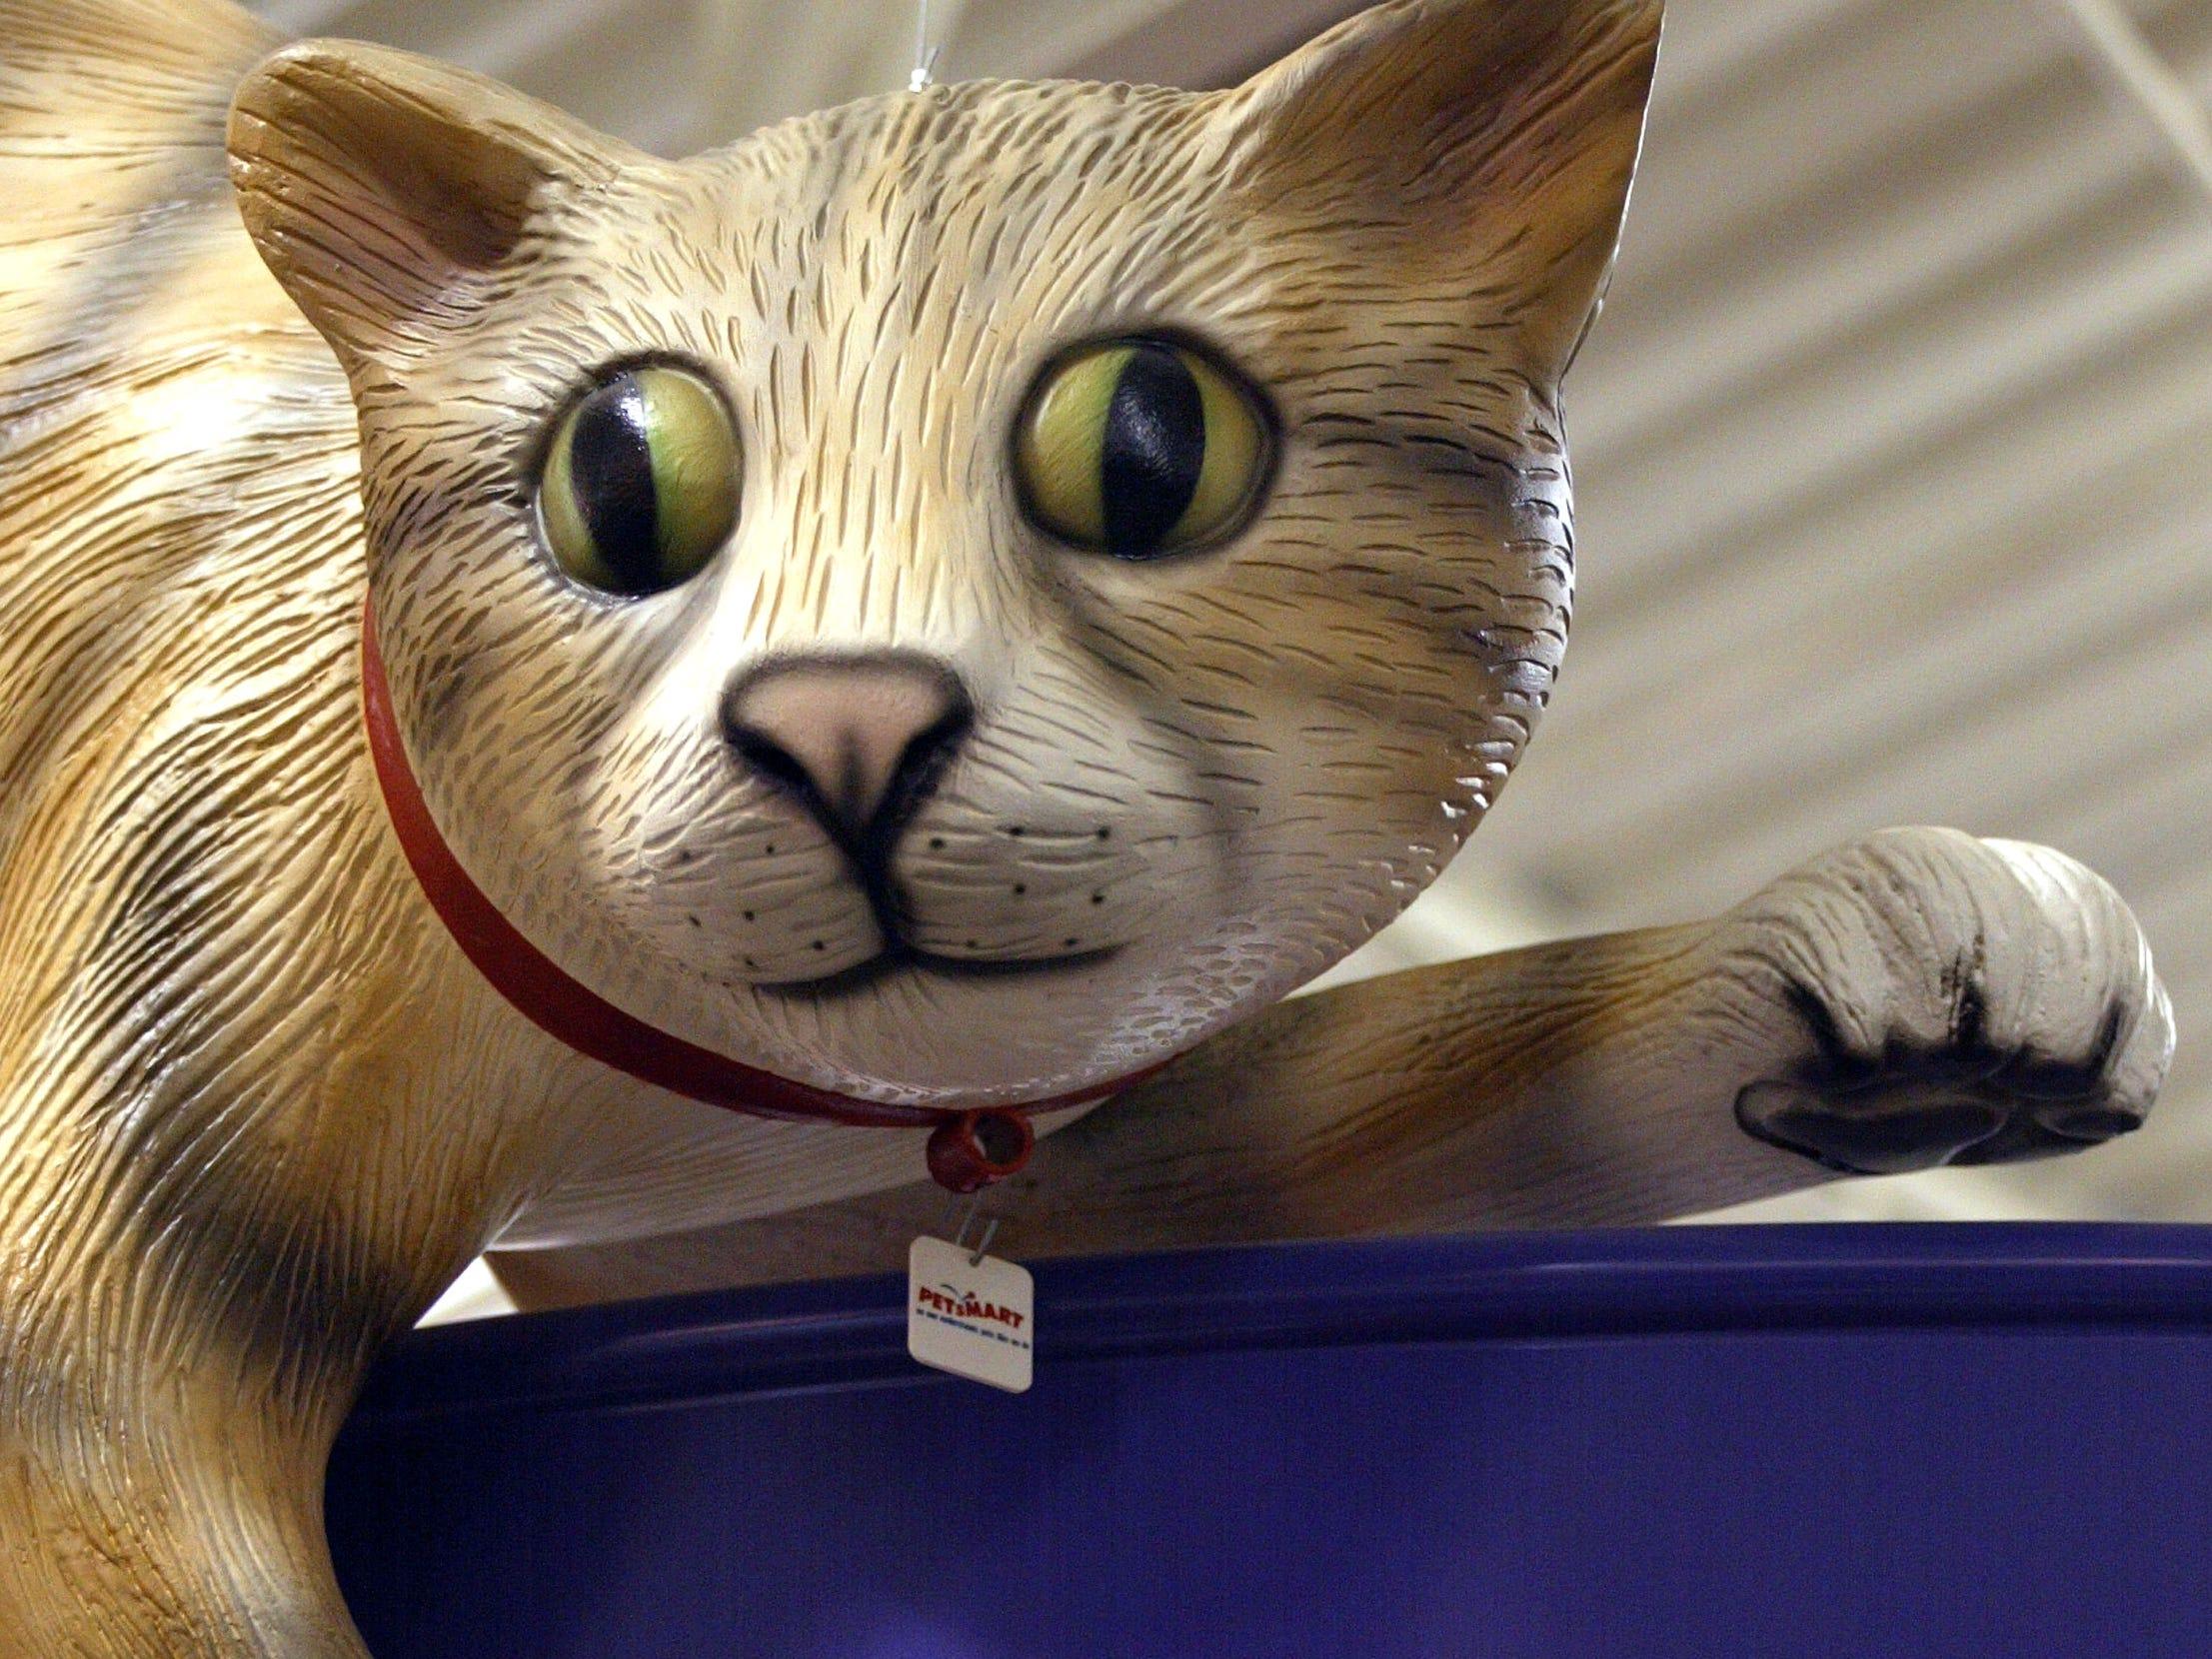 PetSmart,hiring 410. The company provides pet supplies and services. More info:careers.petsmart.com.